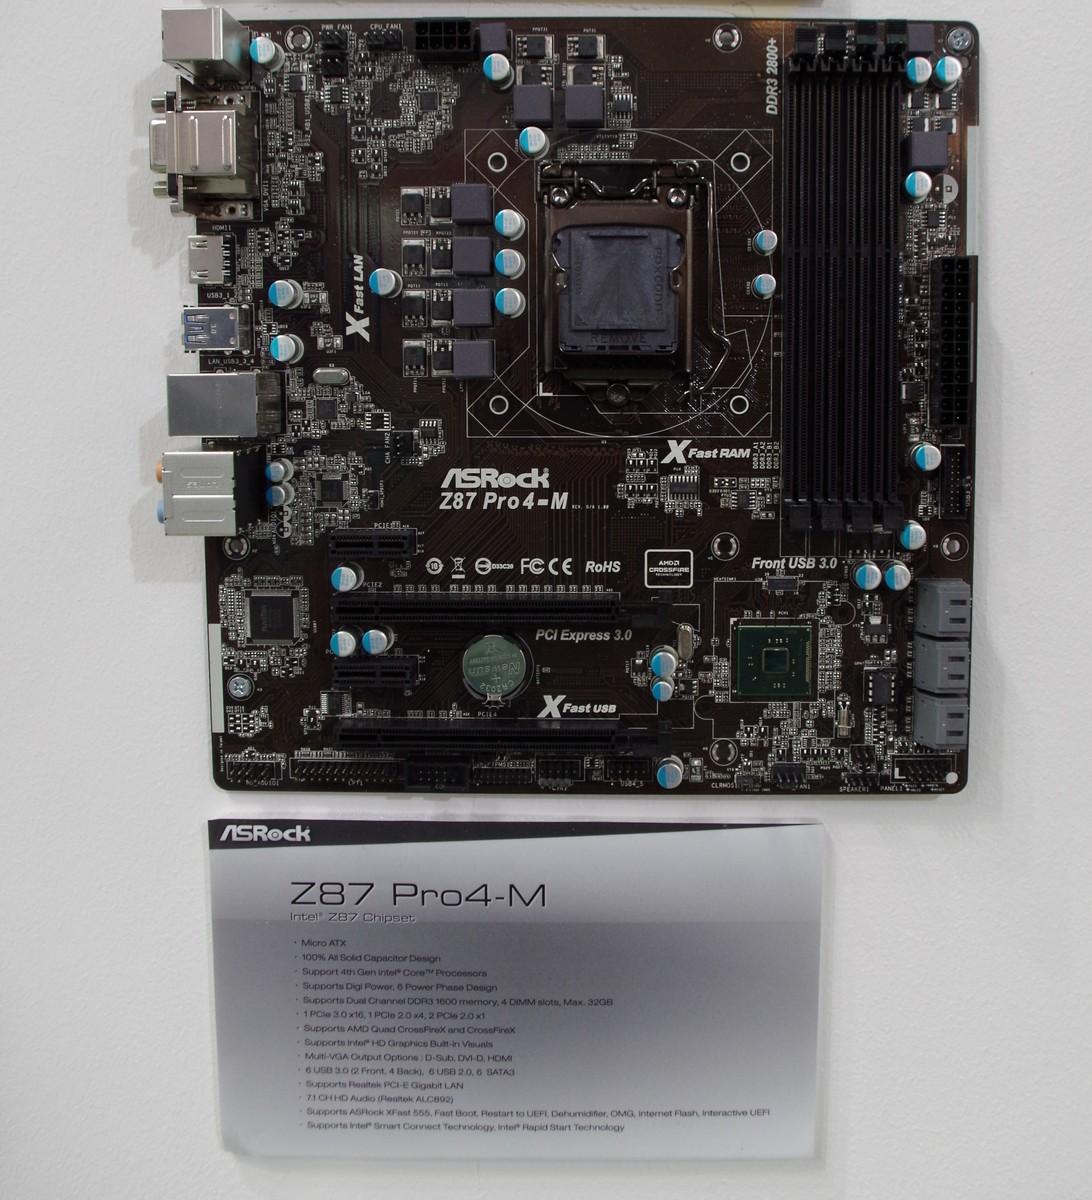 ASRock Z87 Pro4-M (MicroATX)